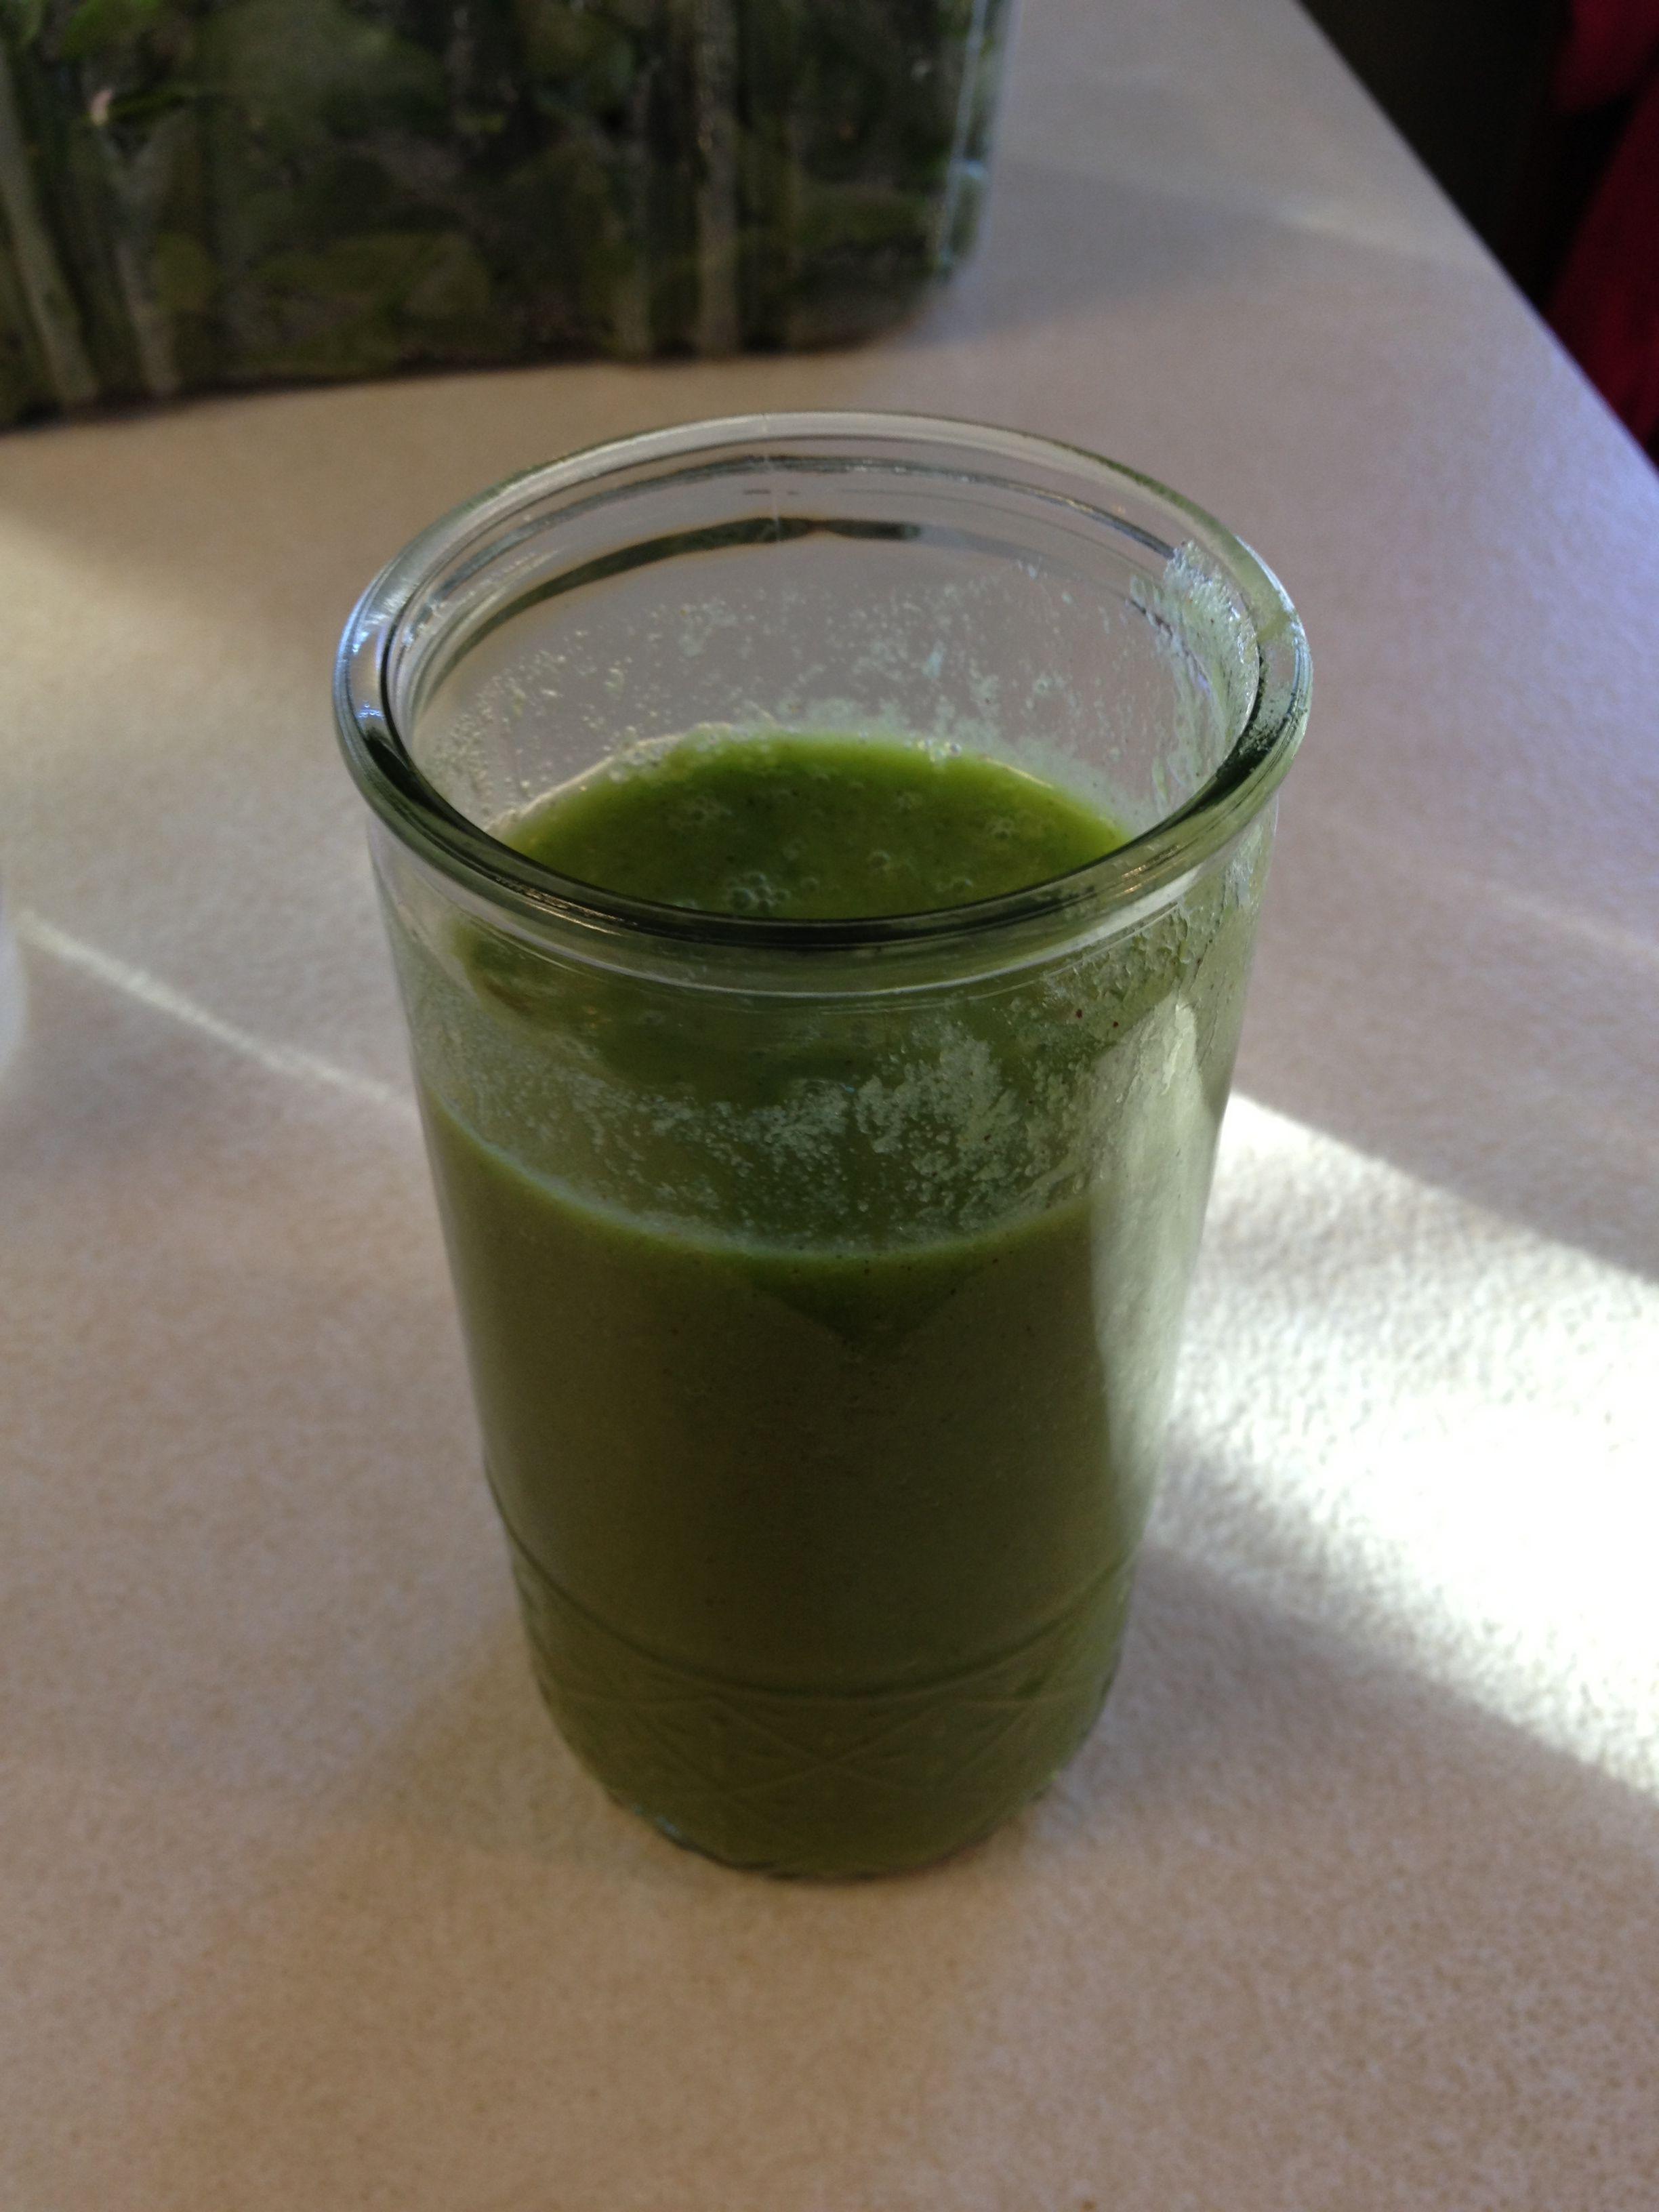 My version of Green Machine Homemade Apple Juice All